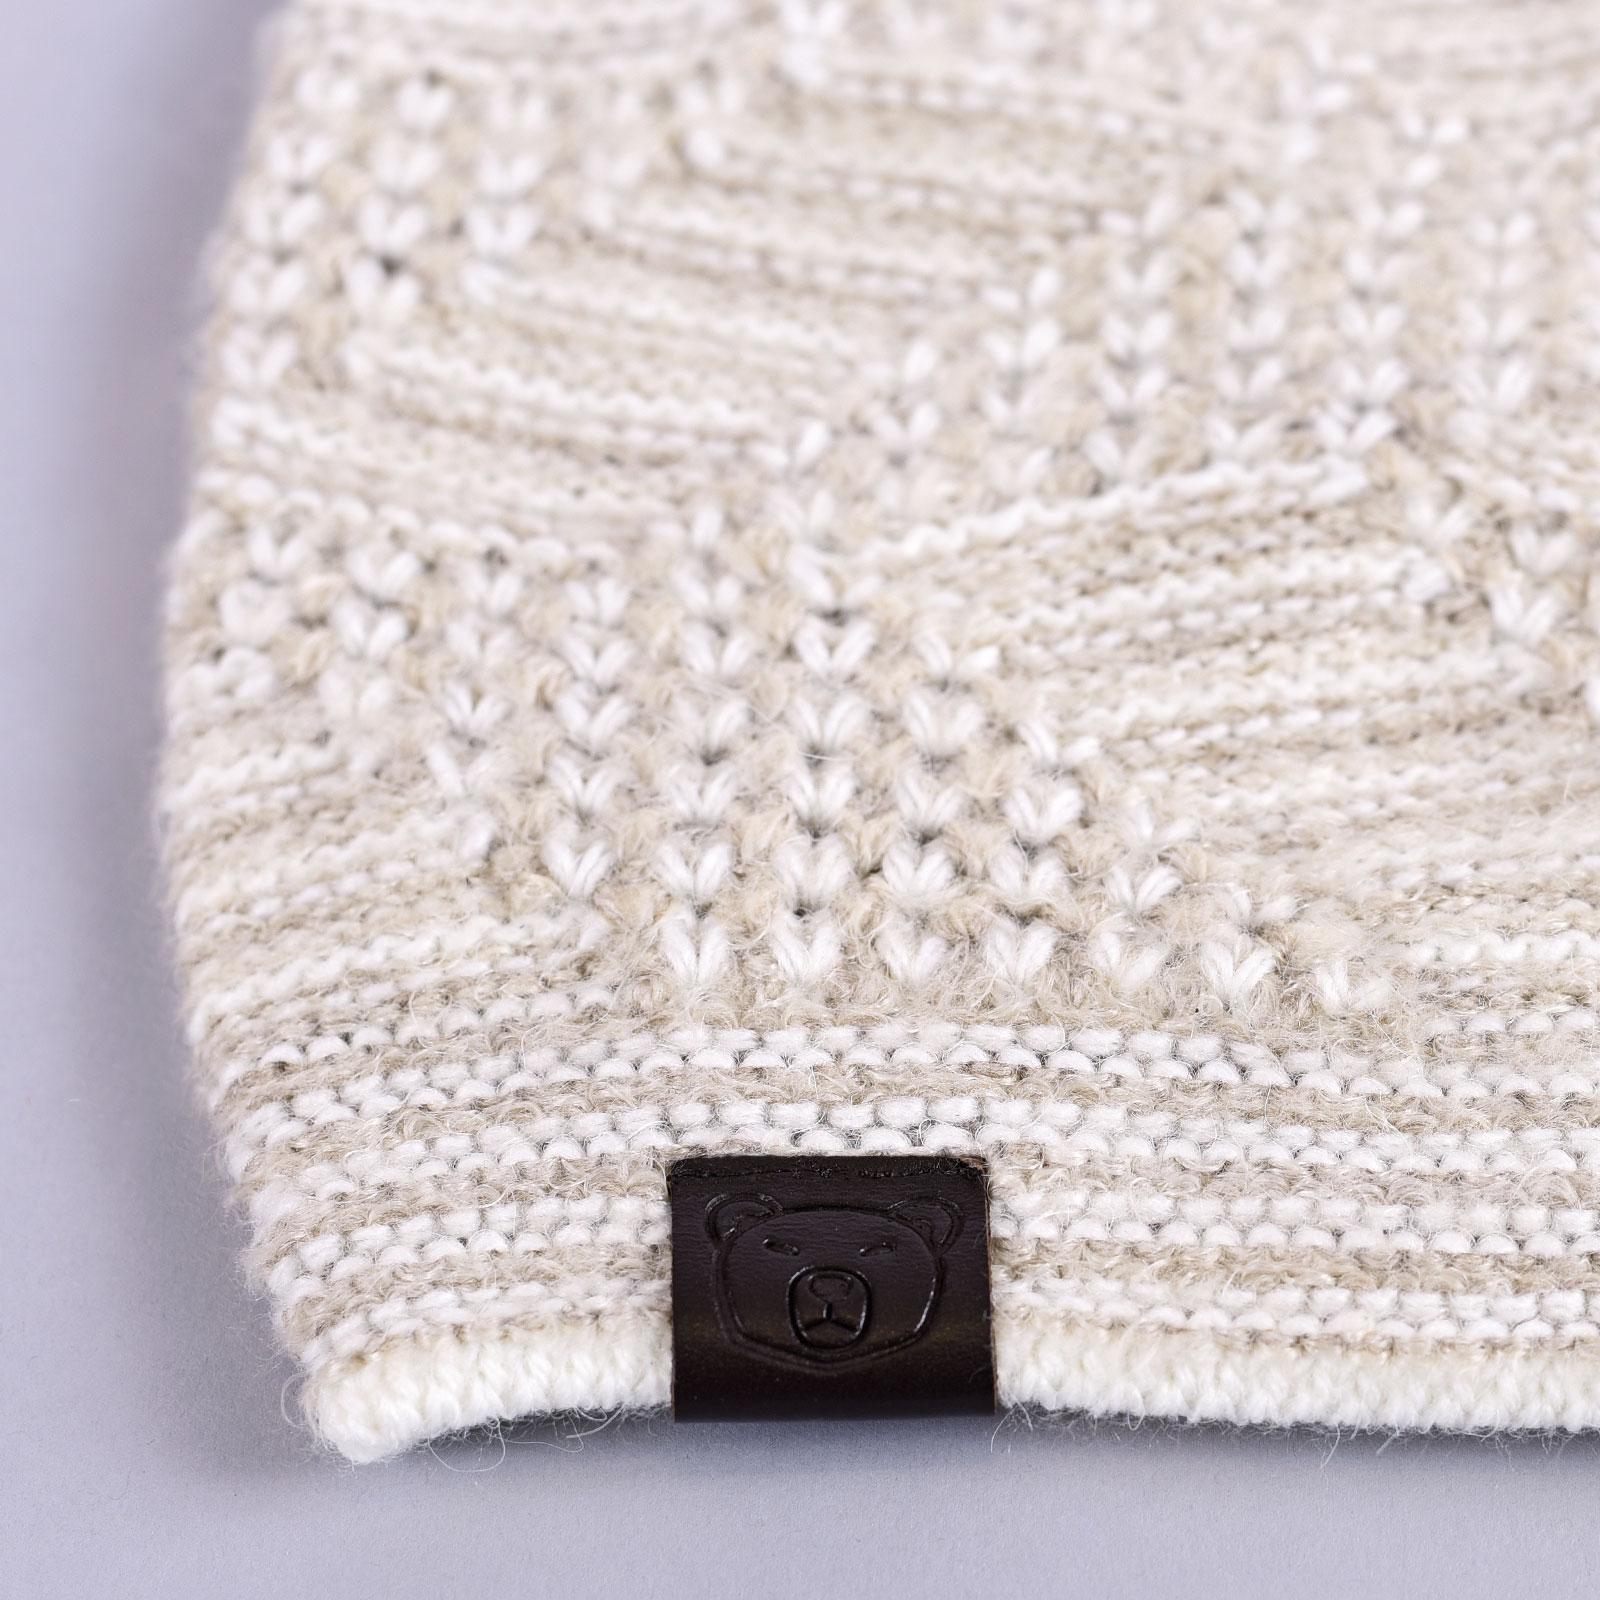 CP-01047-D16-1-bonnet-long-femme-beige